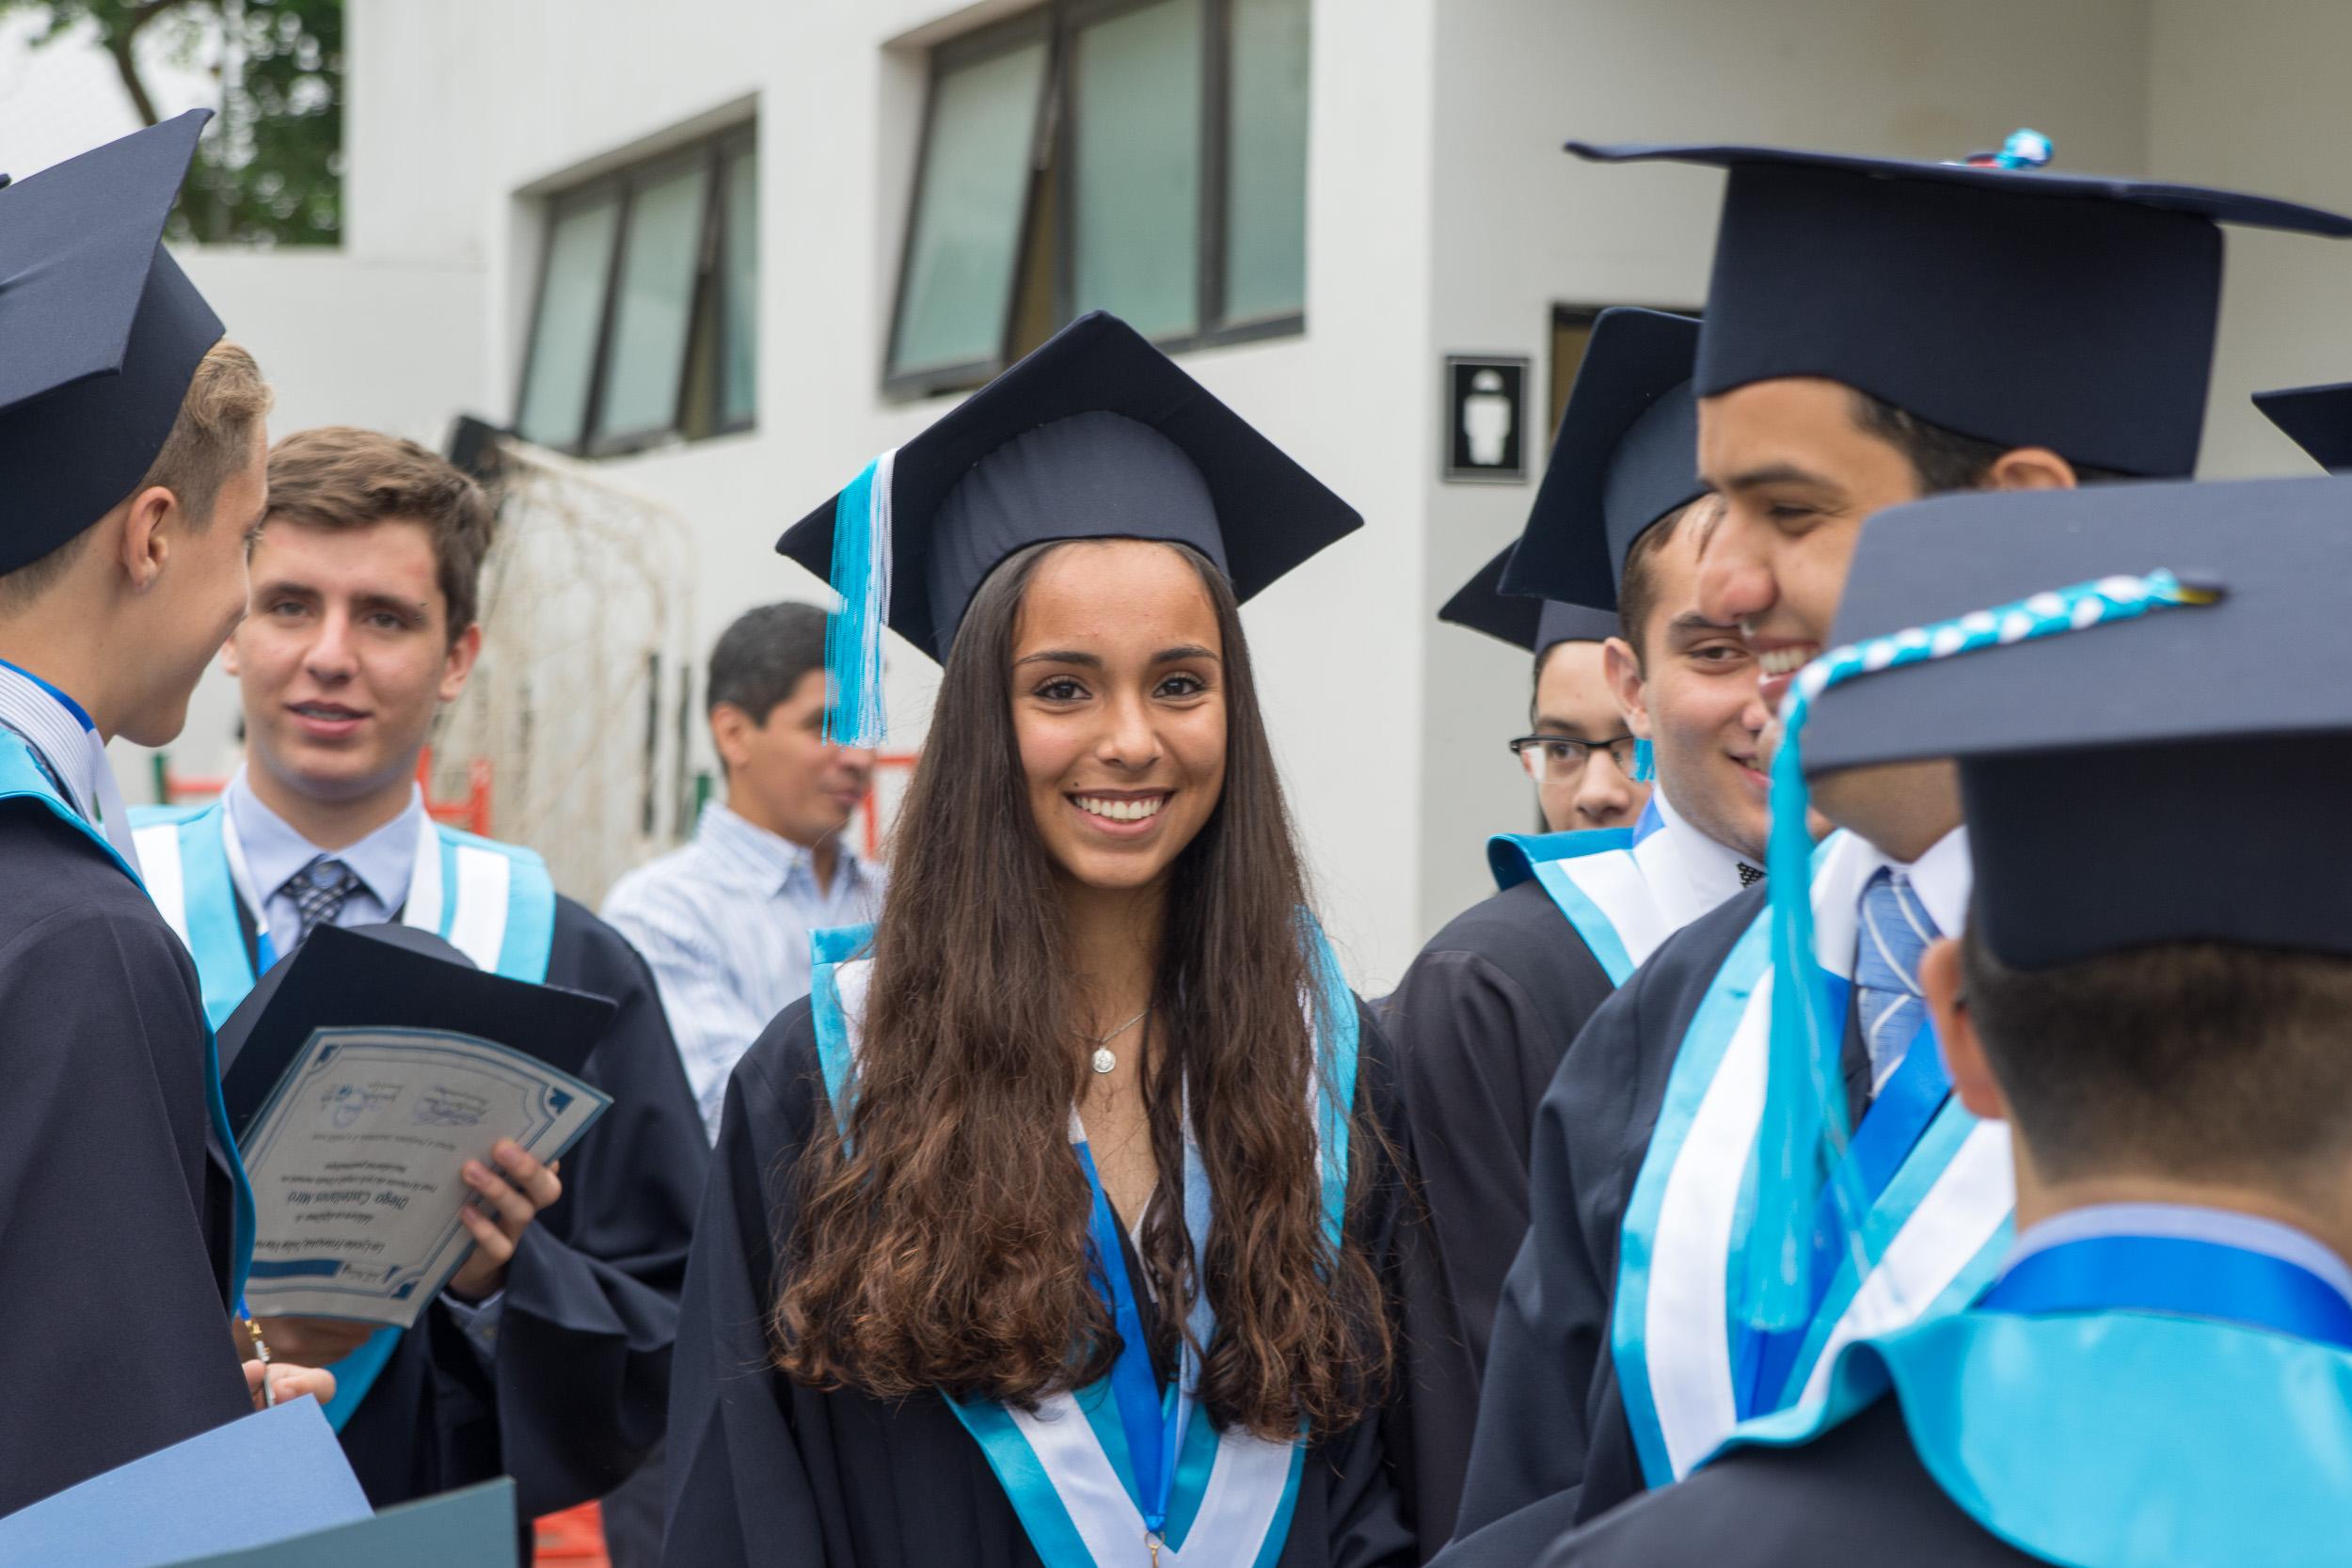 graduaciones-joselarabayer-fotografo-02.jpg